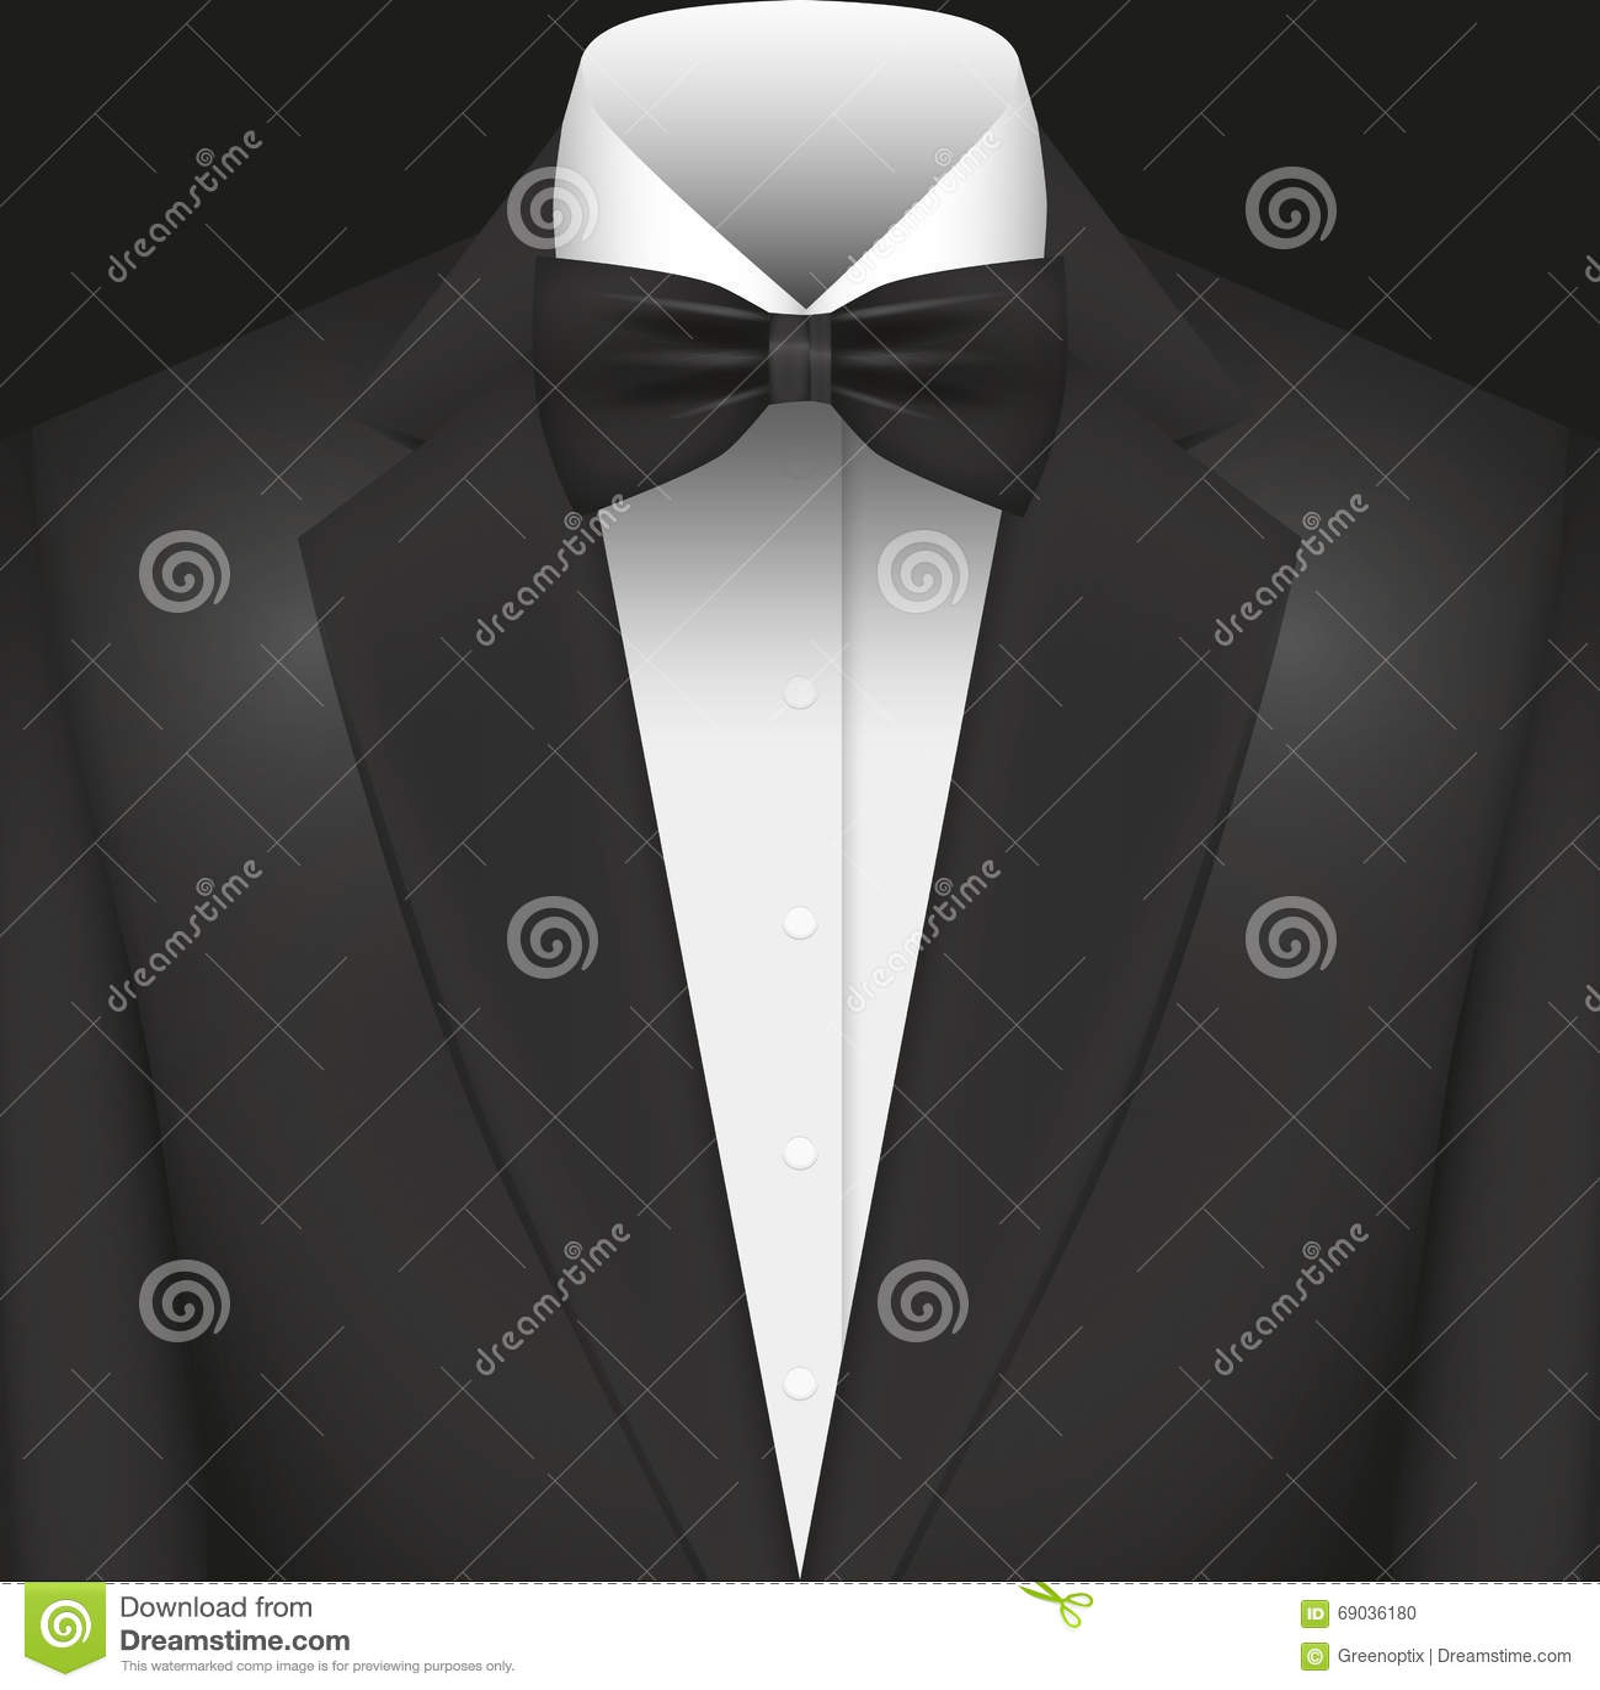 illustrations vektor grafik anzug mit fliege stock abbildung bild 69036180. Black Bedroom Furniture Sets. Home Design Ideas